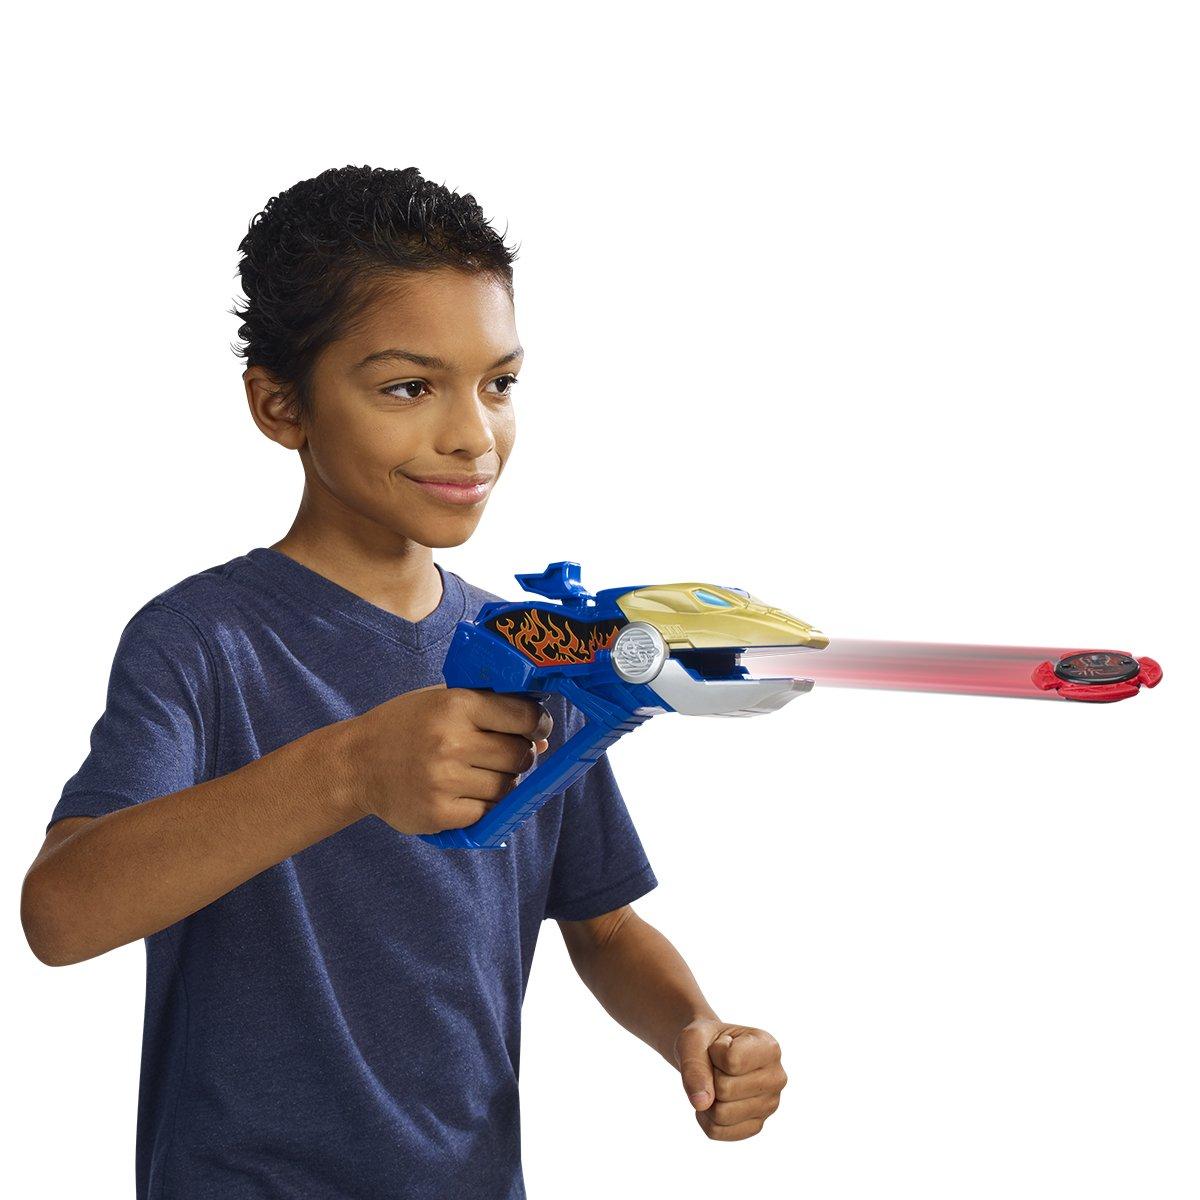 Pistola de Juguete, 4 a/ño s ,, Ampolla Bandai 43535 Armas de Juguete